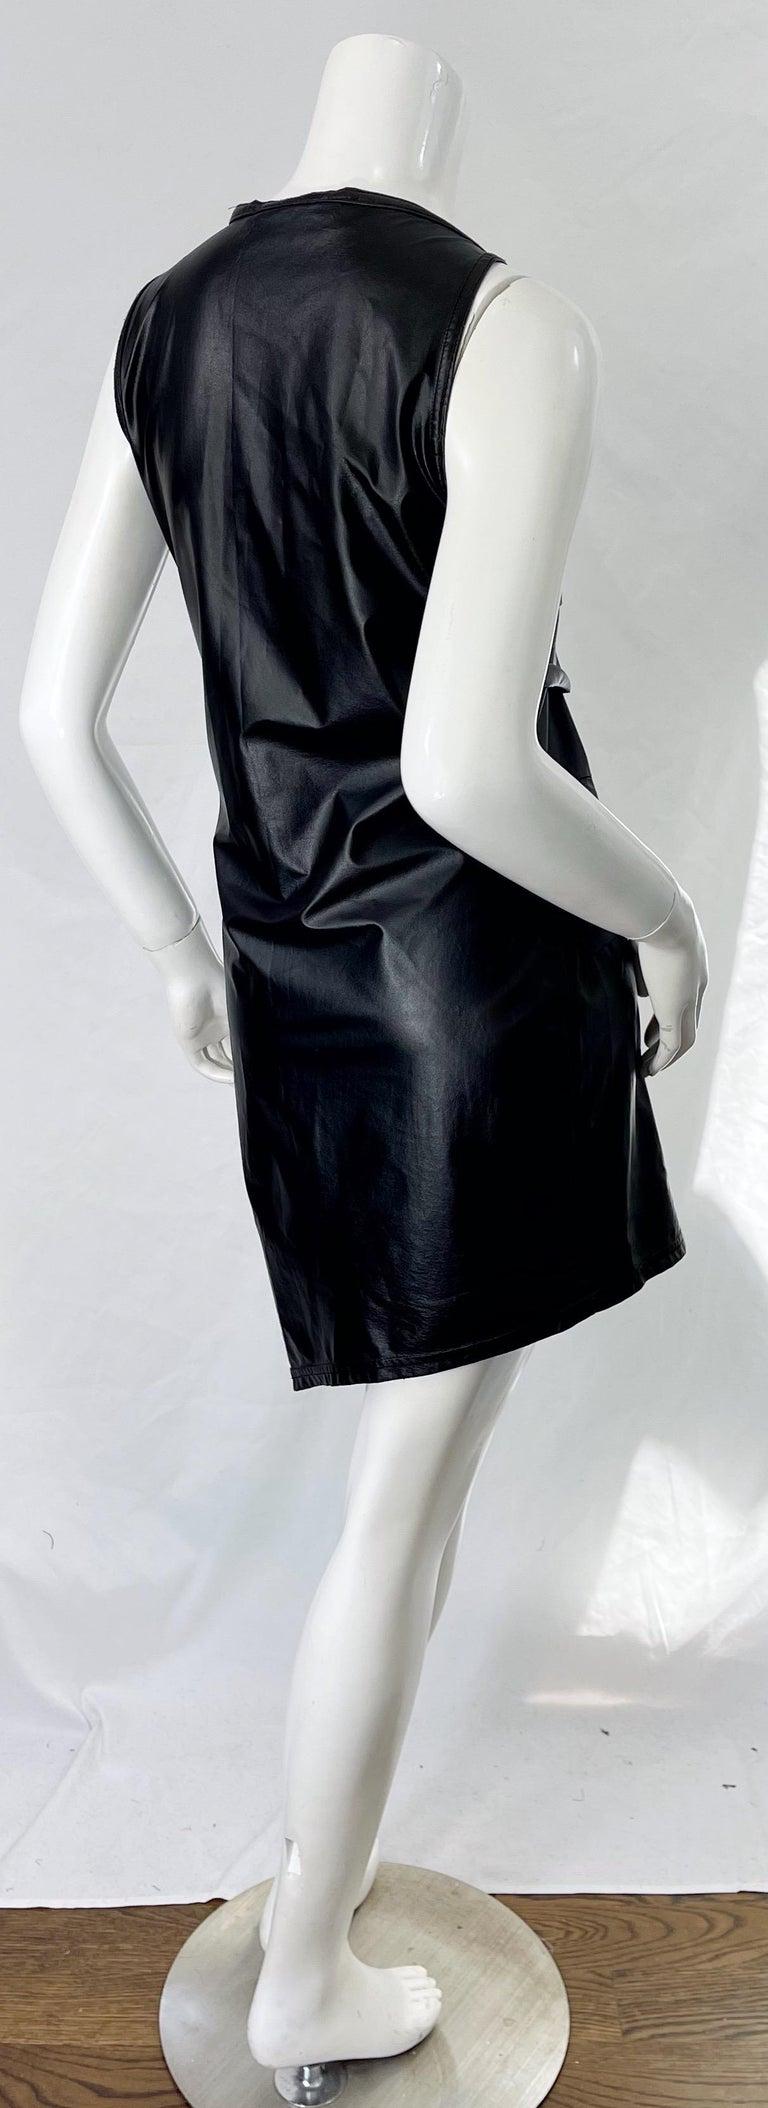 1990s Dexter Wong Club Kid Rave Japanese Black Pleather Vintage 90s Mini Dress For Sale 2